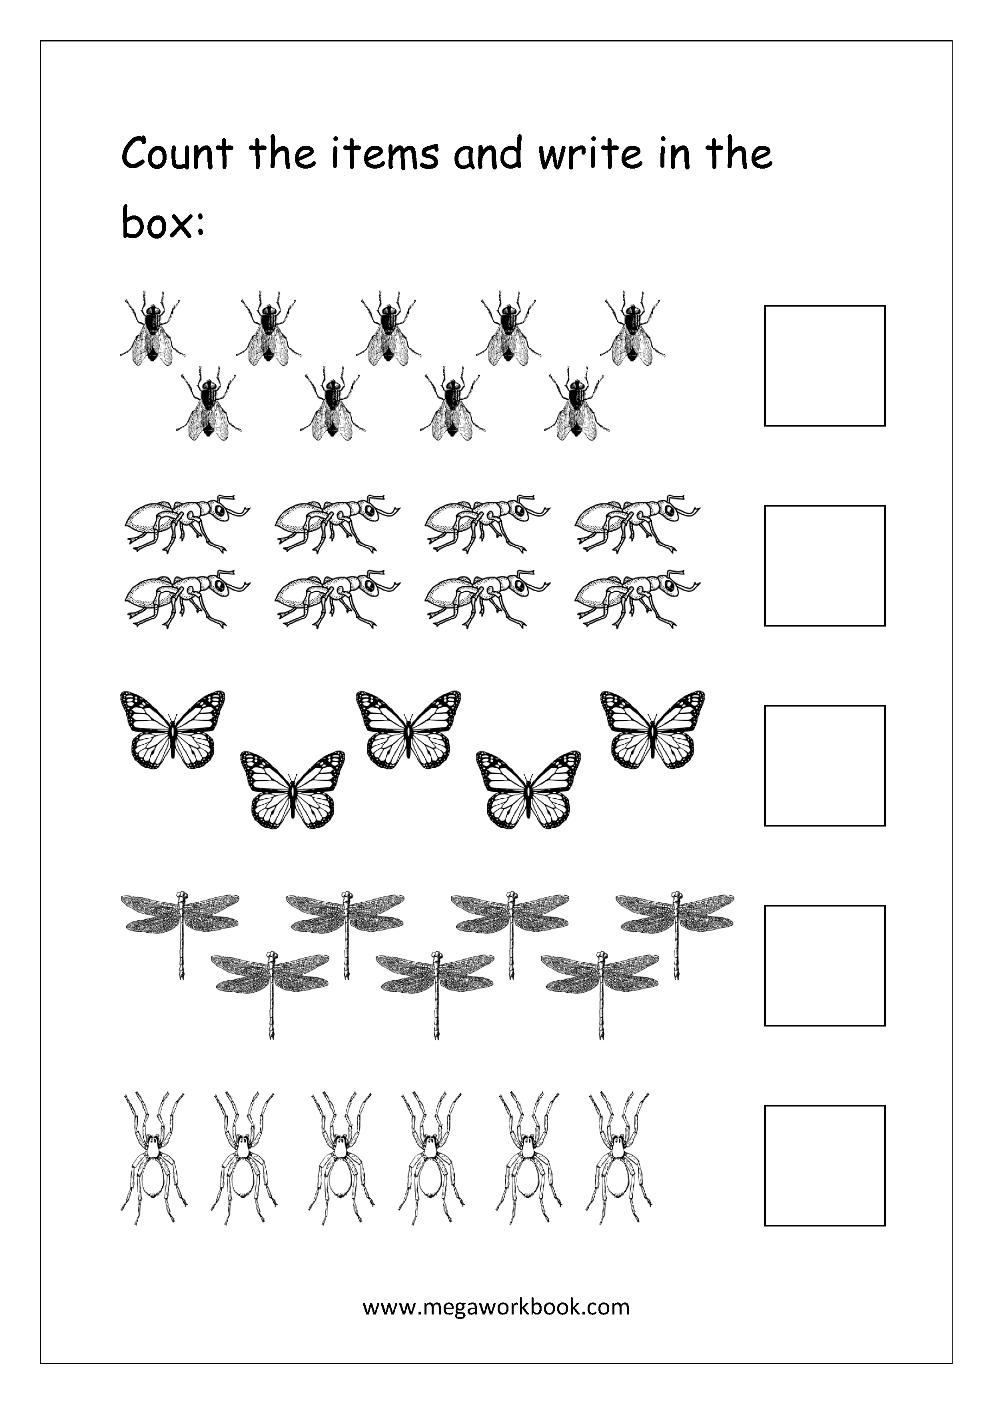 Free Printable Number Counting Worksheets - Count And Match - Count | Free Printable Counting Worksheets 1 20